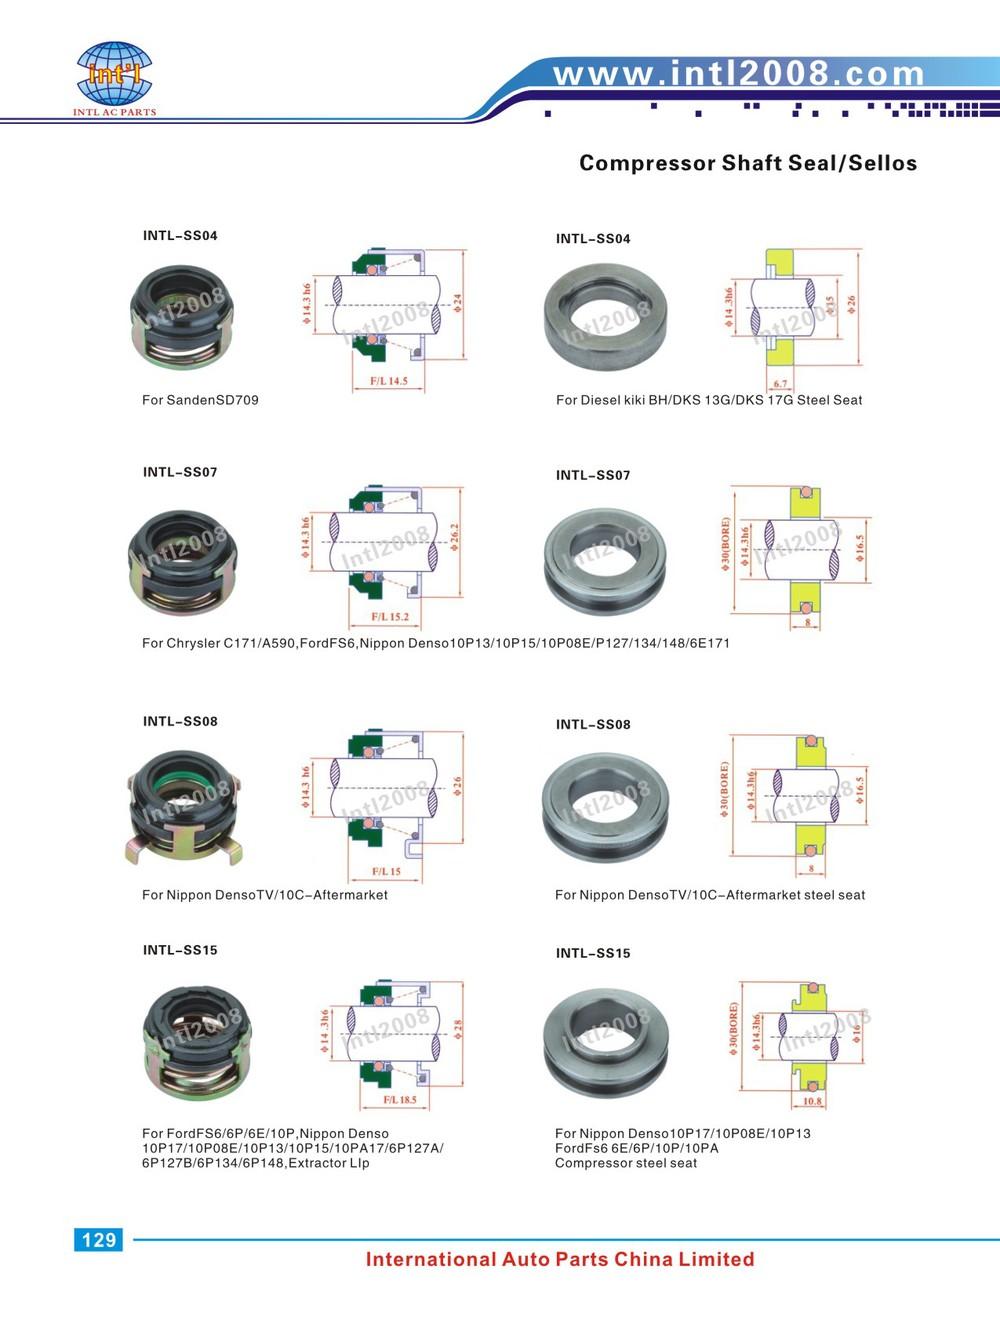 Auto Air Ac Compressor Shaft Lip Seal For Gm Da6 Ht6 Hr6 Hr6he R4 V5 A C Wiring Diagram More Pictures View